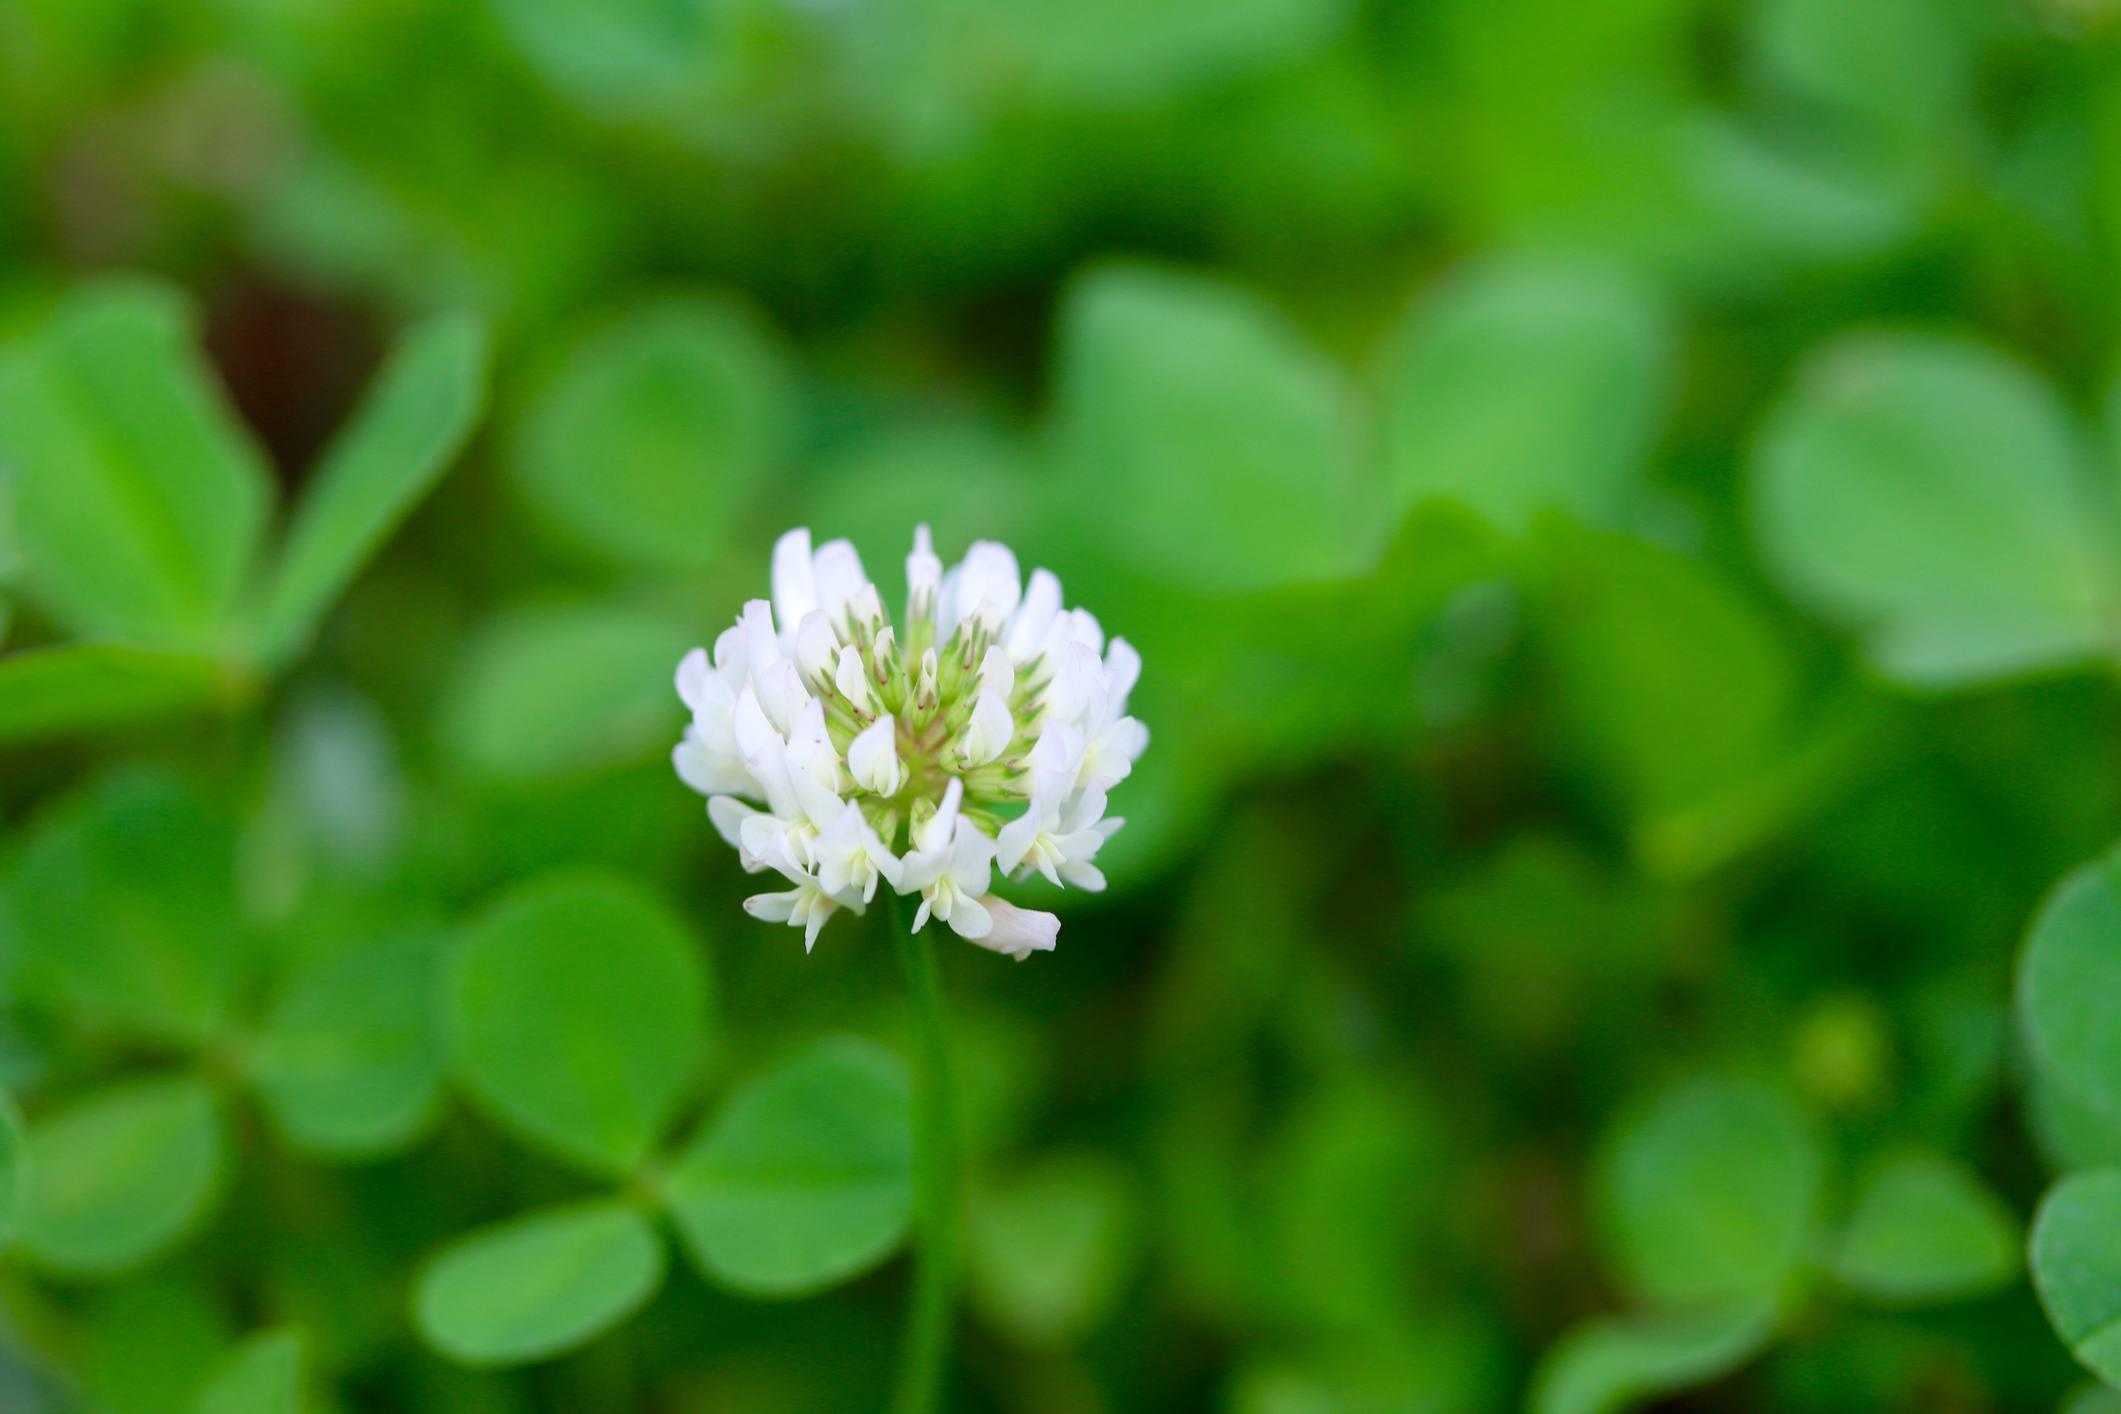 Trébol blanco en flor